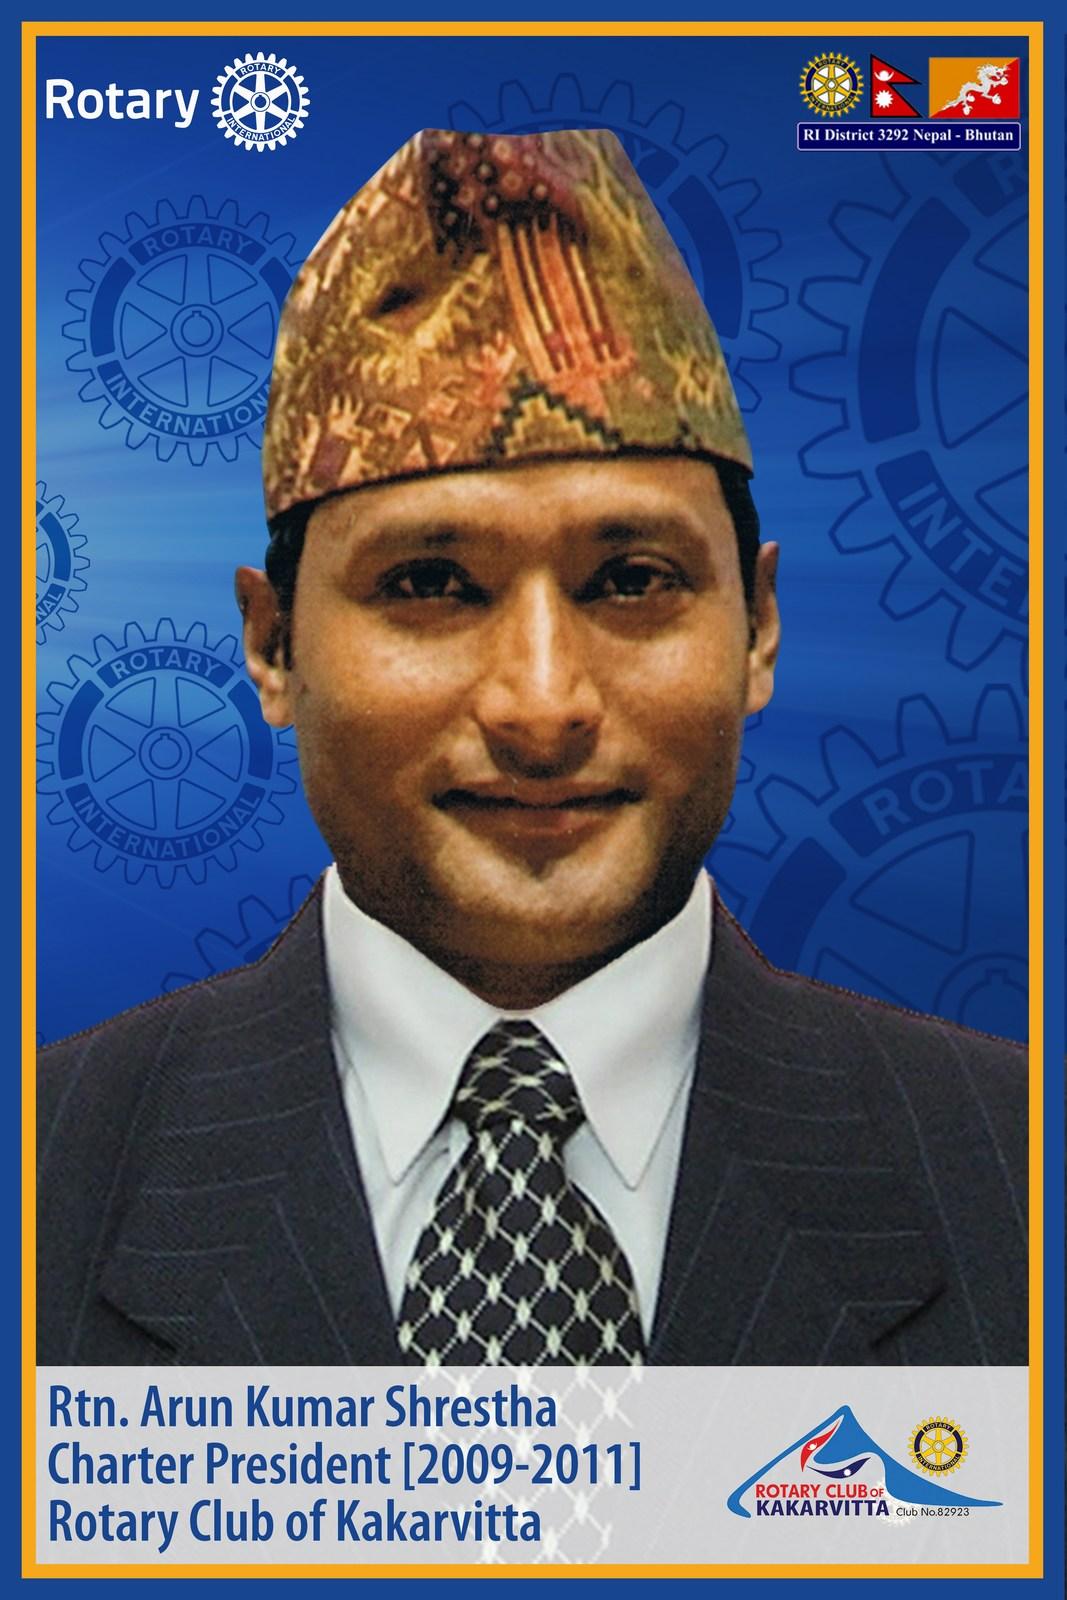 Rtn.-Late-Arun-Kumar-Shrestha-Charter-President-Rotary-Club-of-Kakarvitta